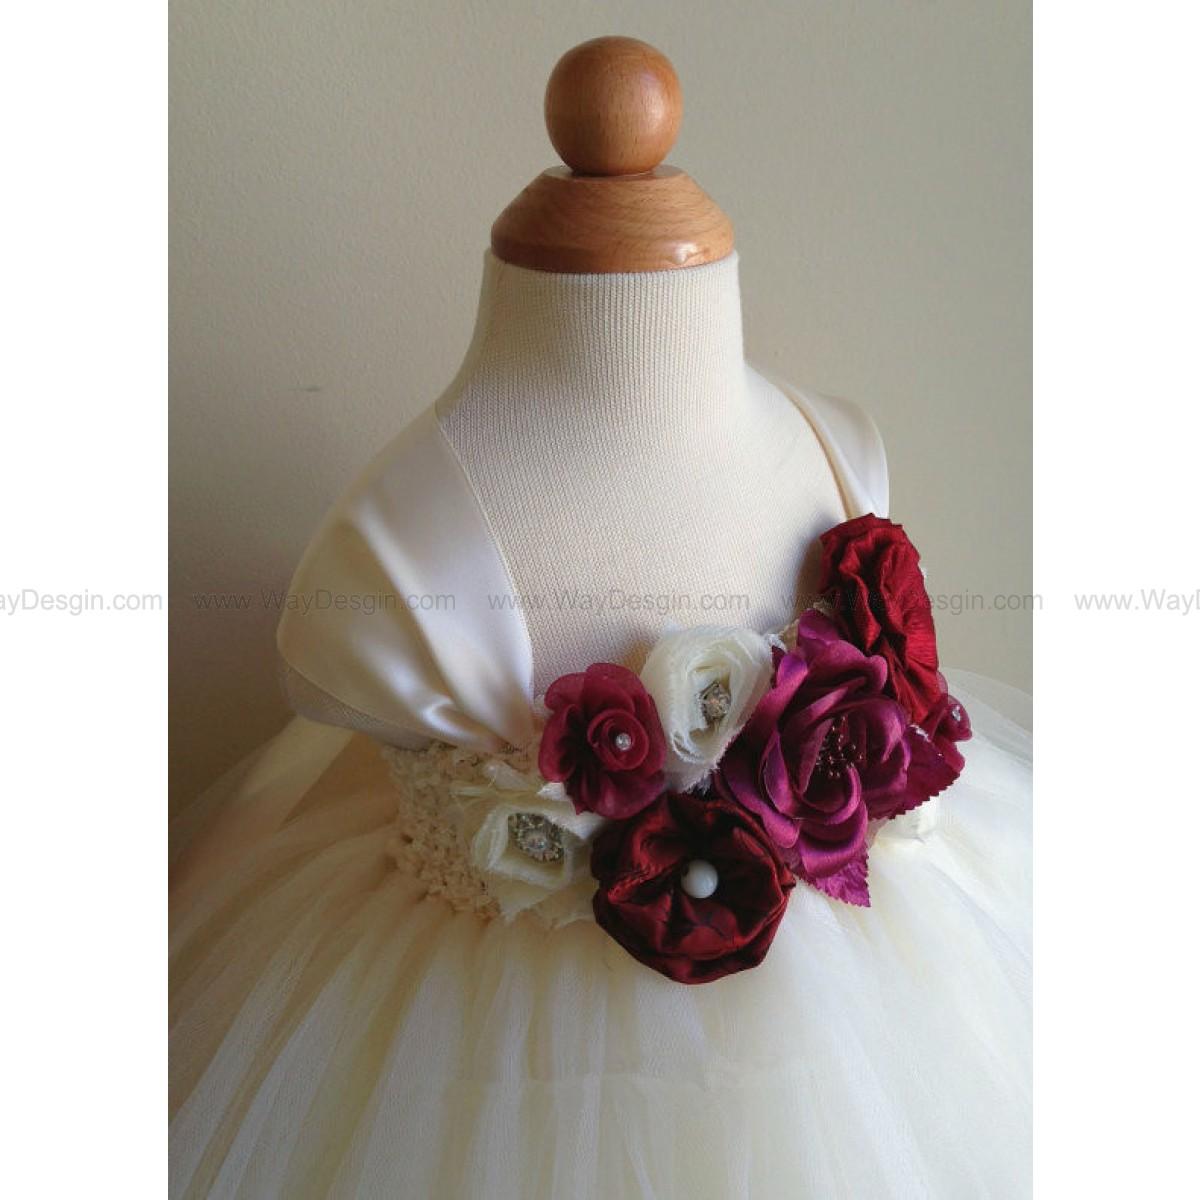 Flower girl dress, ivory and burgundy tutu dress, baby tutu dress, toddler tutu dress, newborn